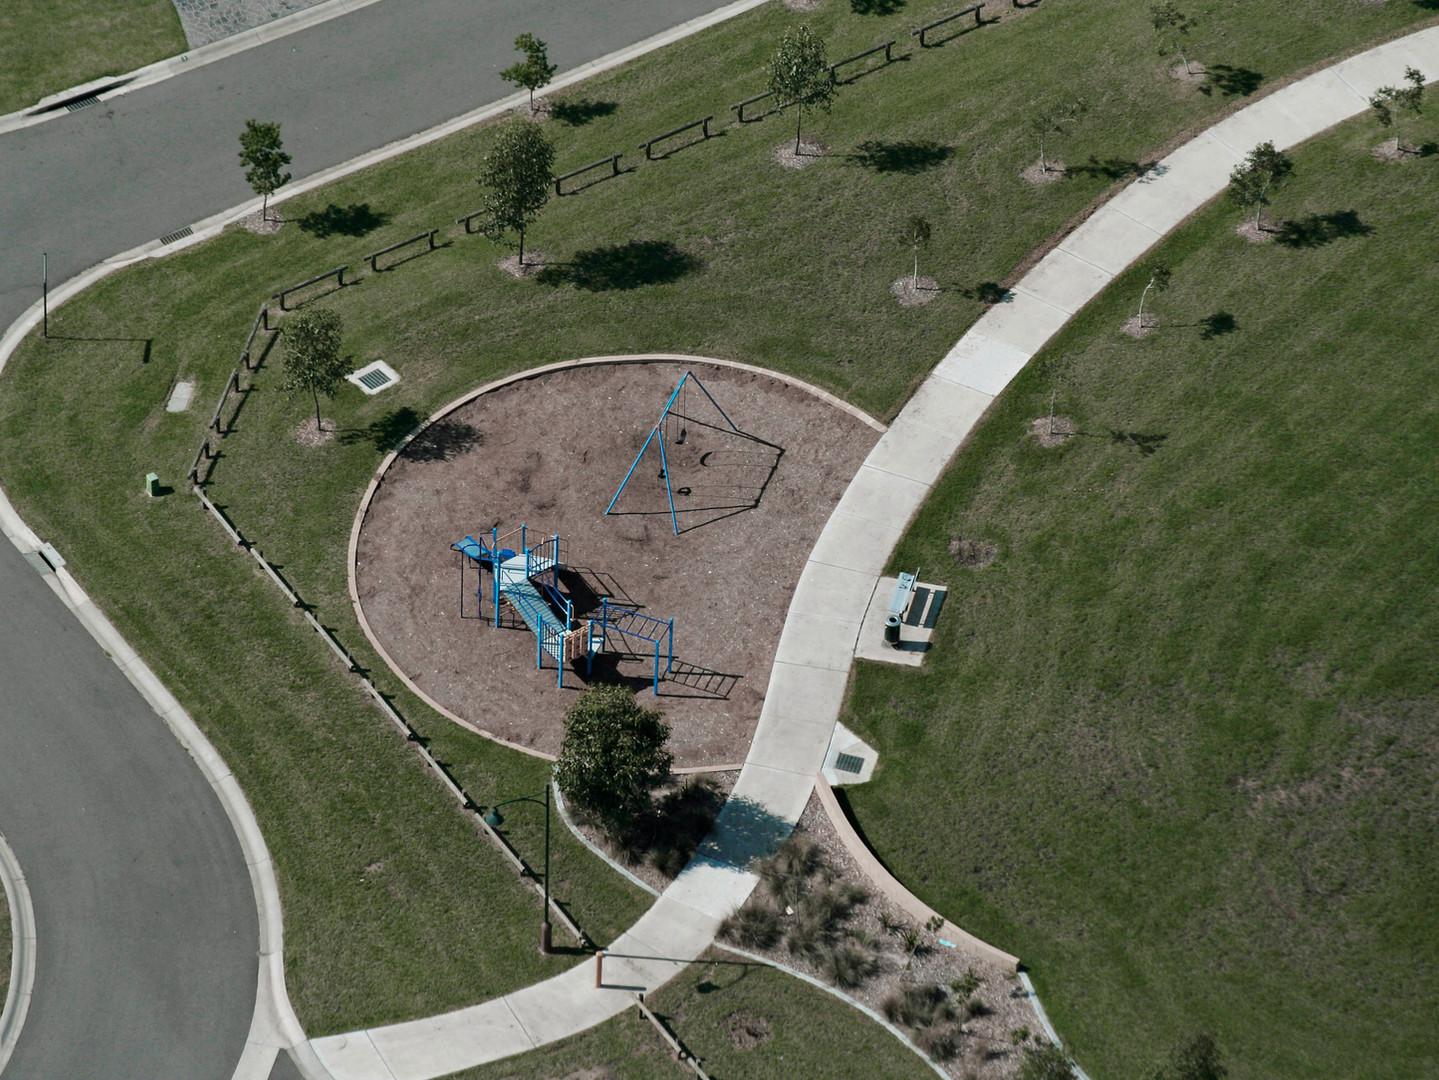 Sunny playground's facilities